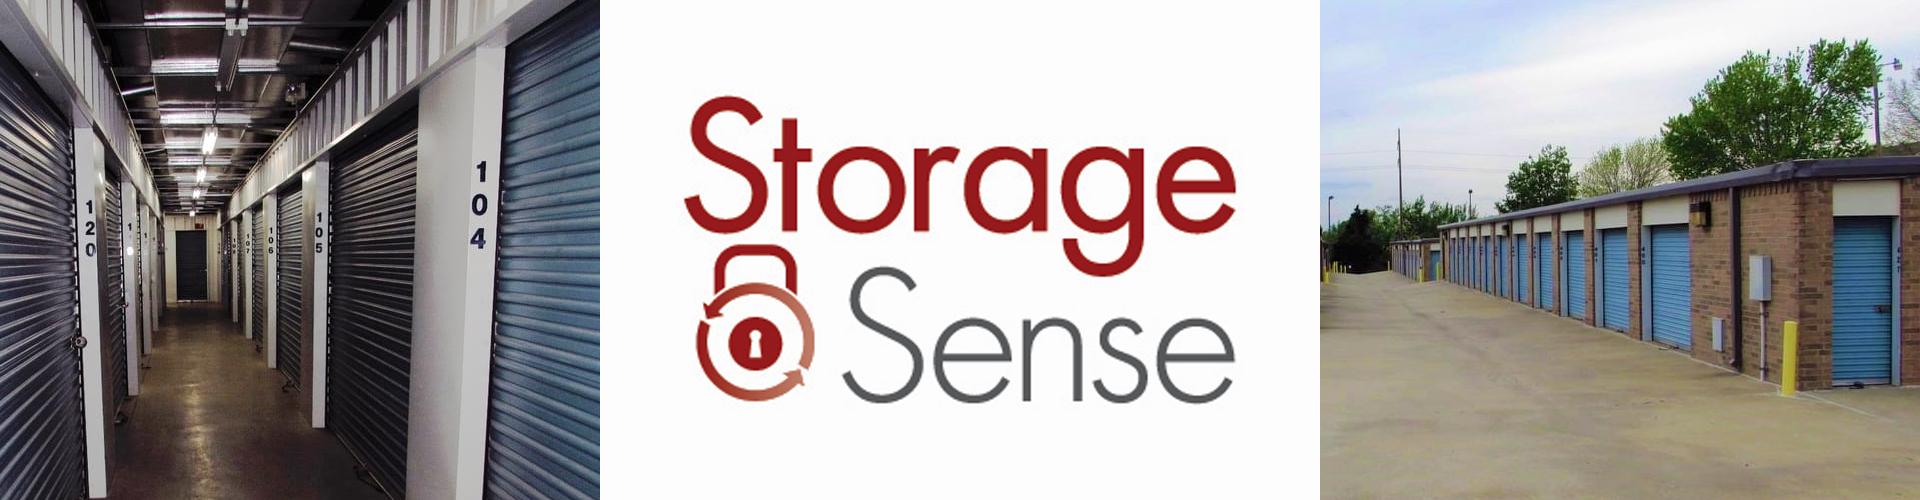 Self Storage units OKC